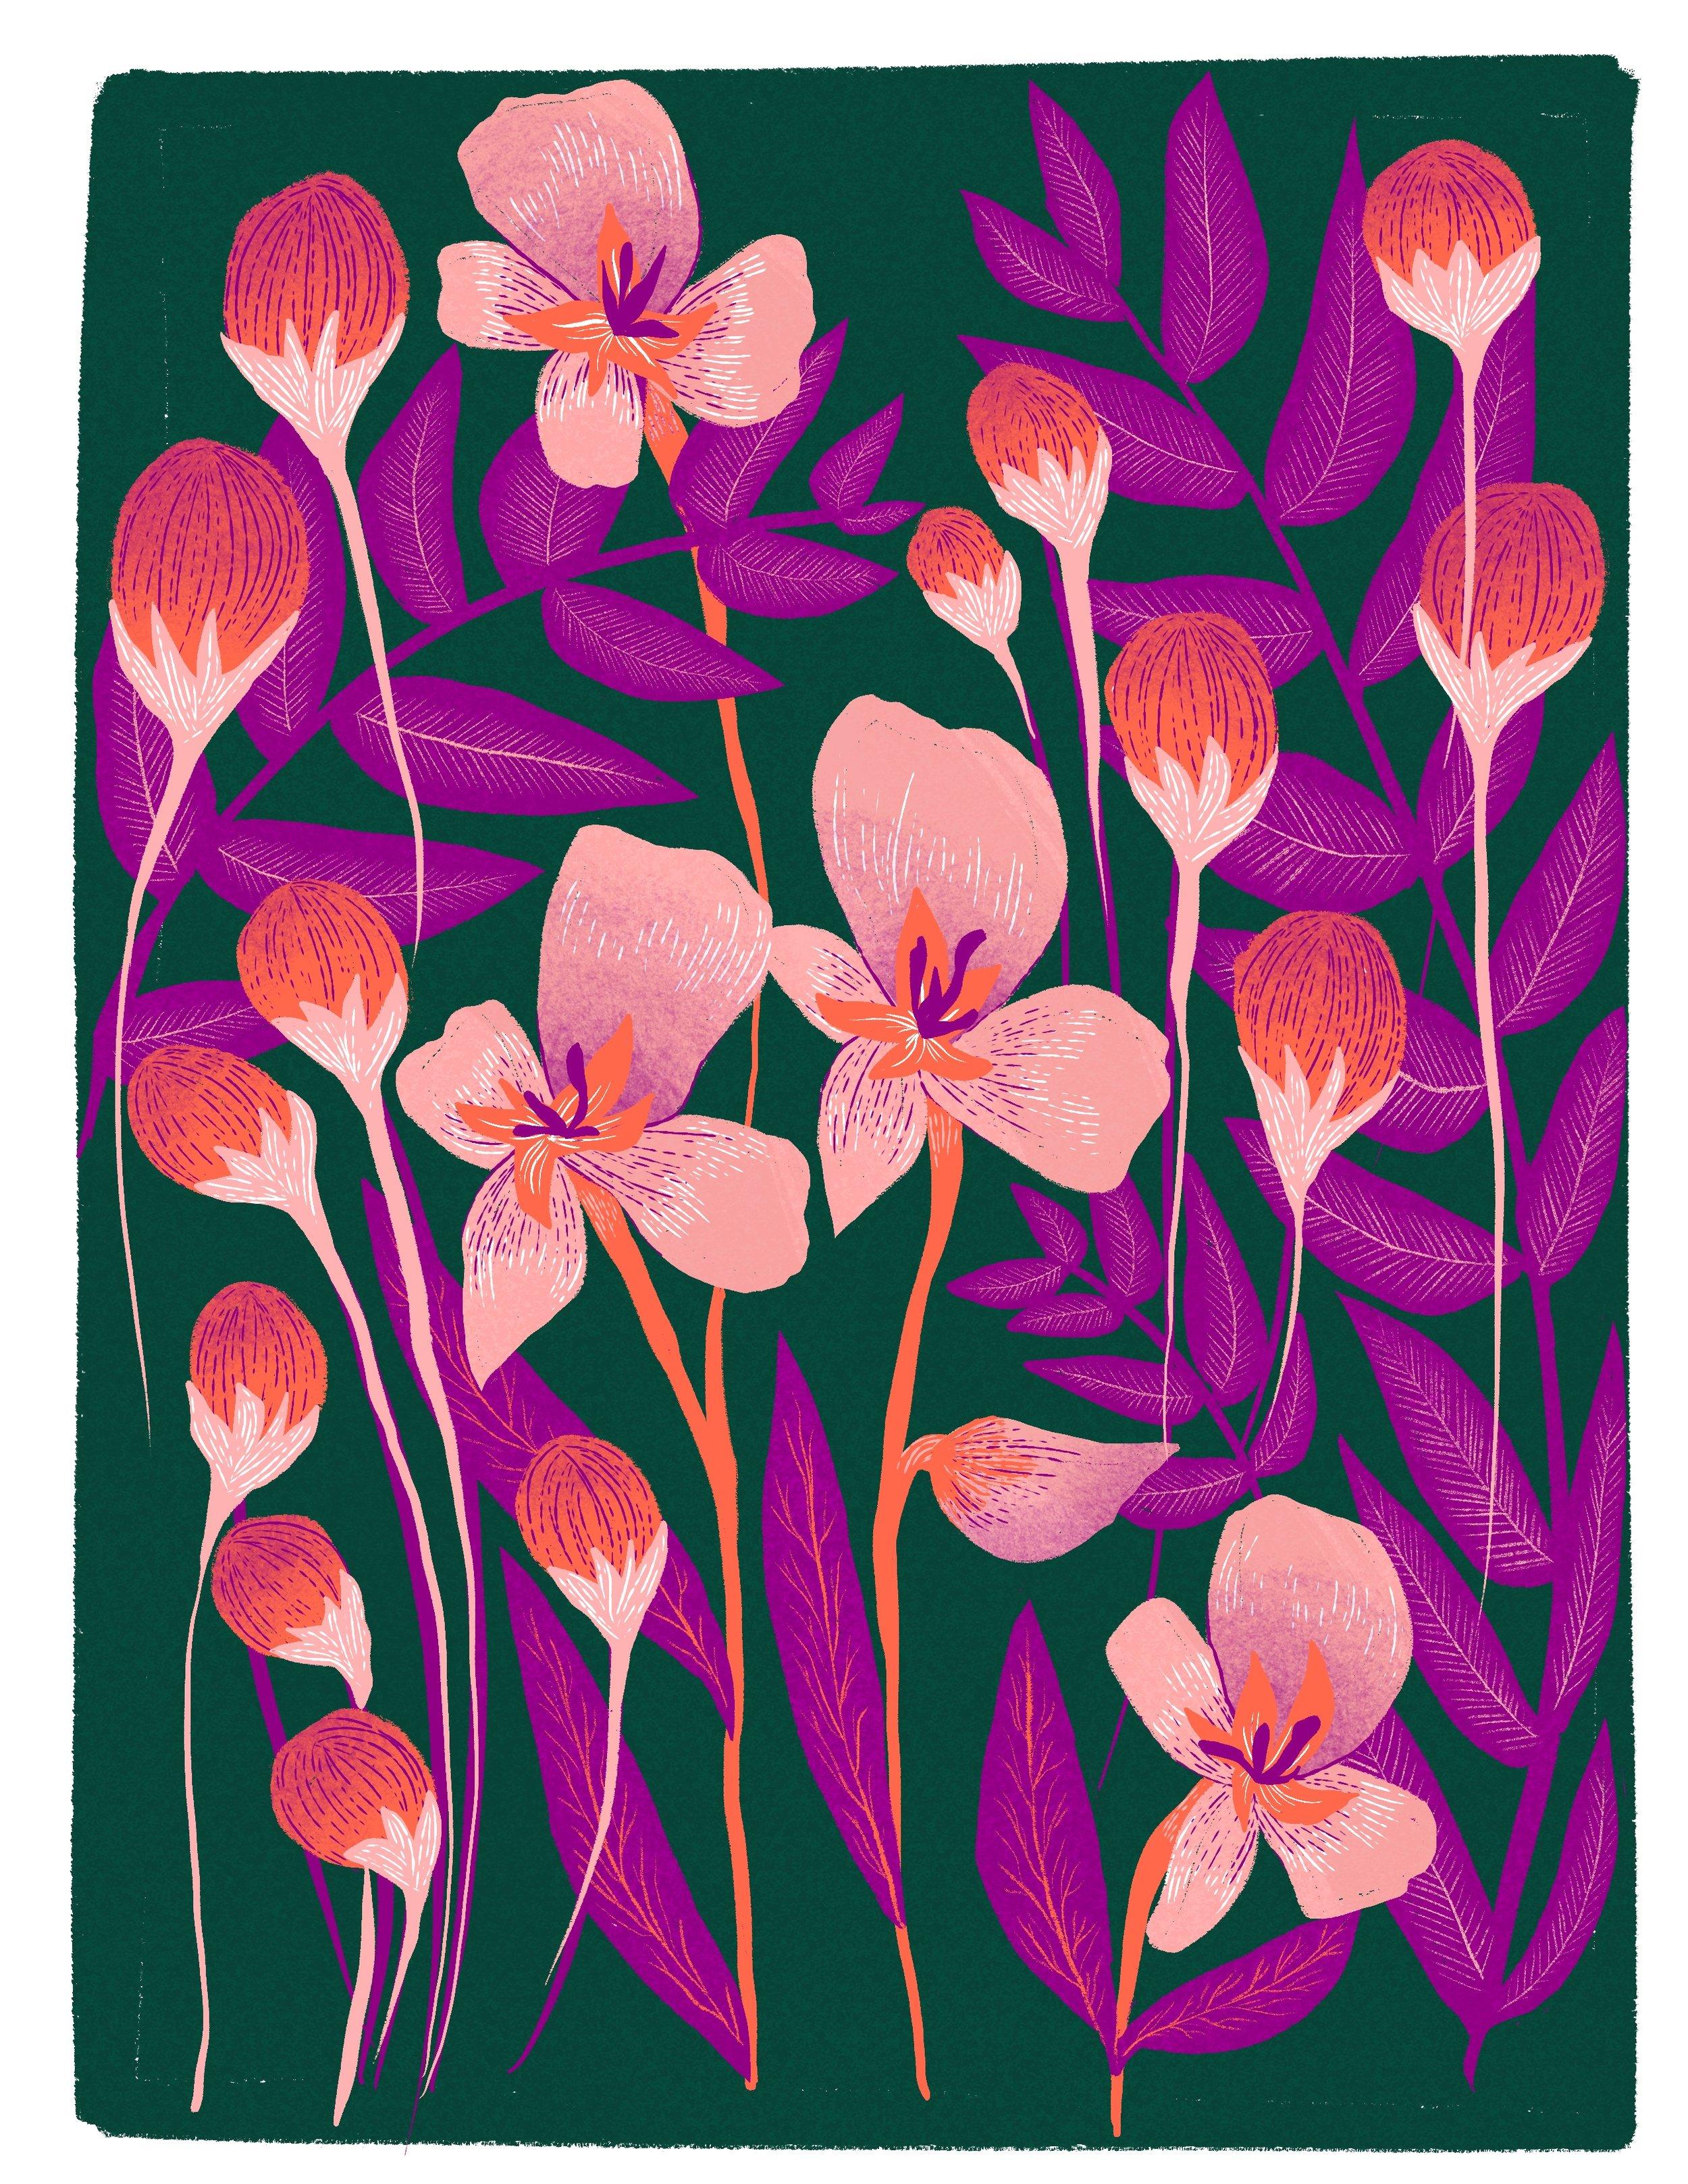 190820_Vintage Flowers Pink Purple_Mallory Cohn.jpg